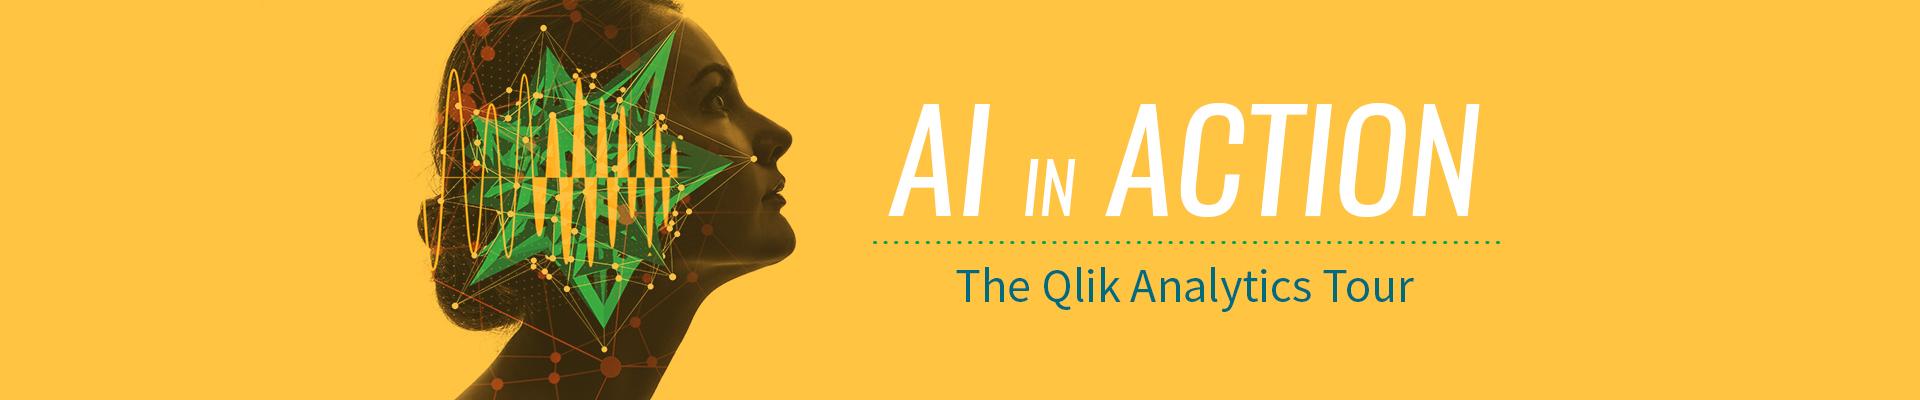 Qlik-Analytics-Tour_LP-Banner_V2A